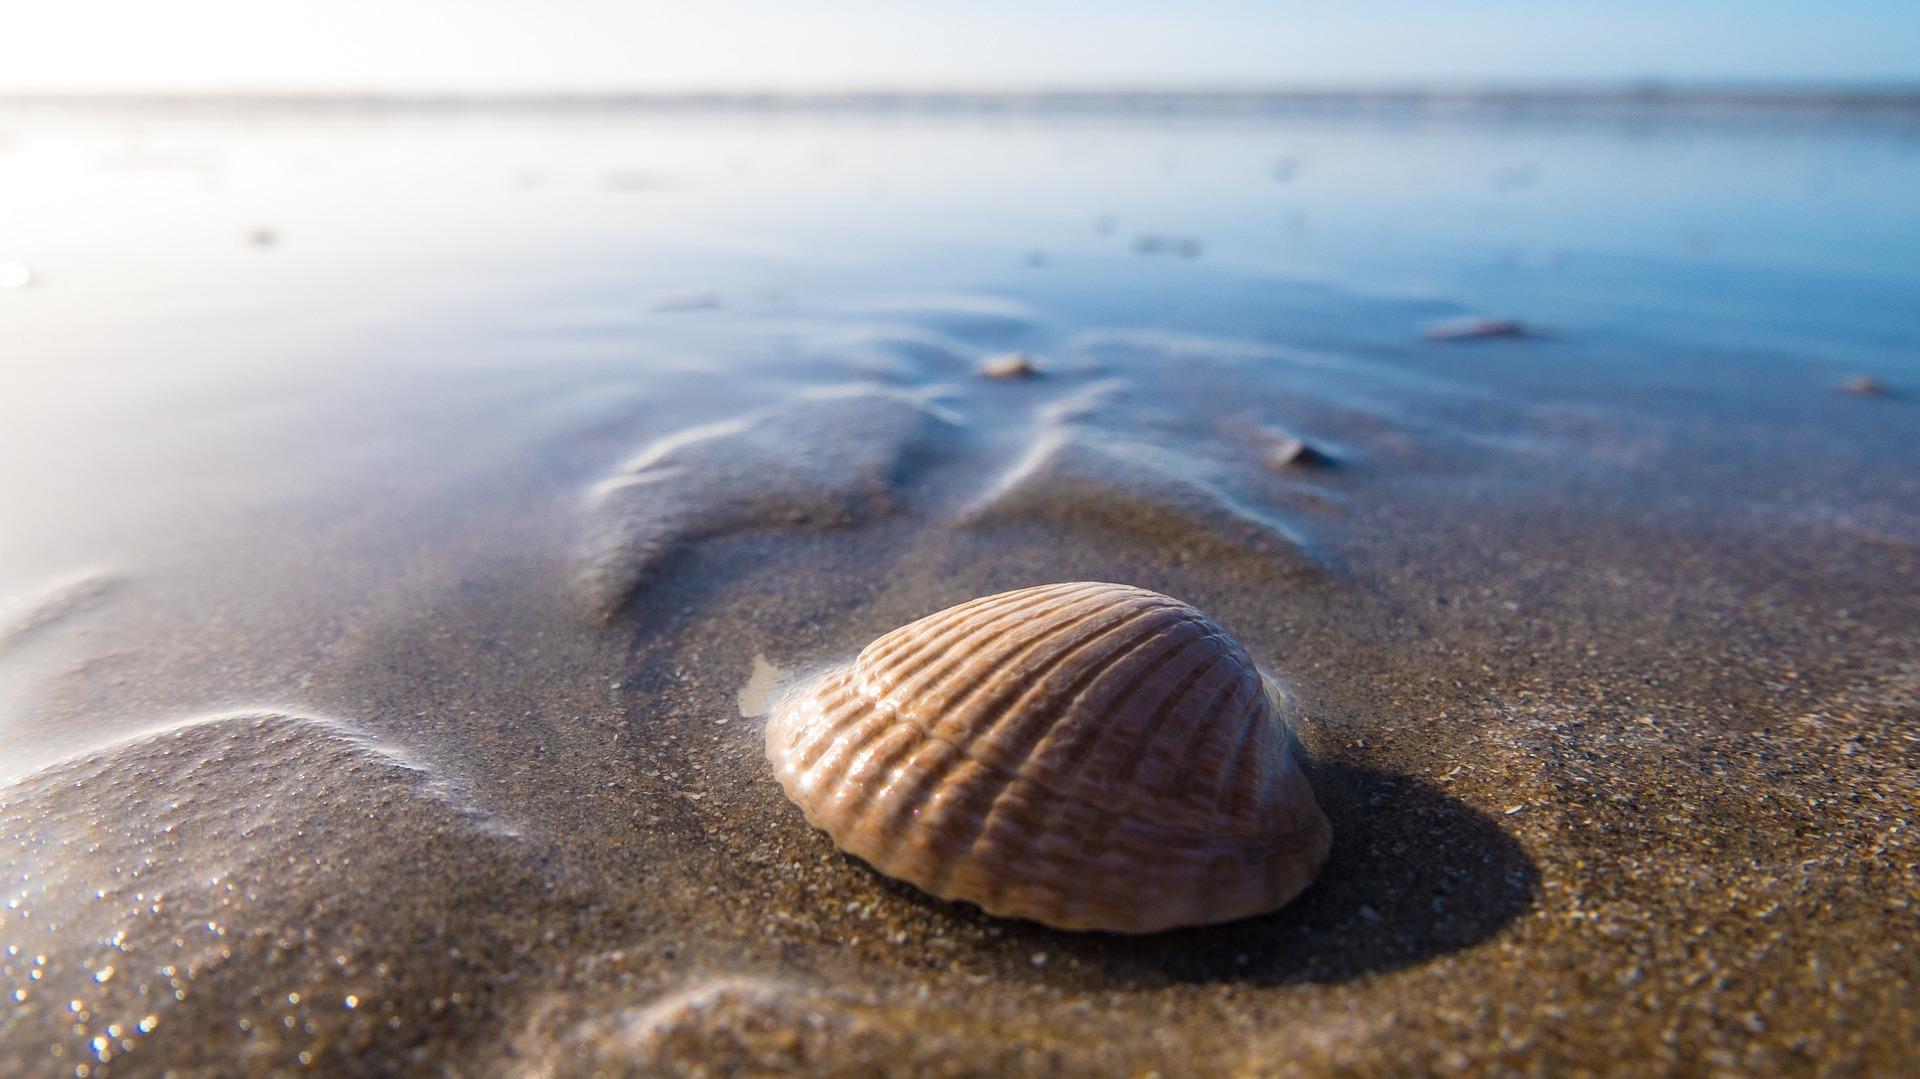 ark shell seashell beach sand low tide